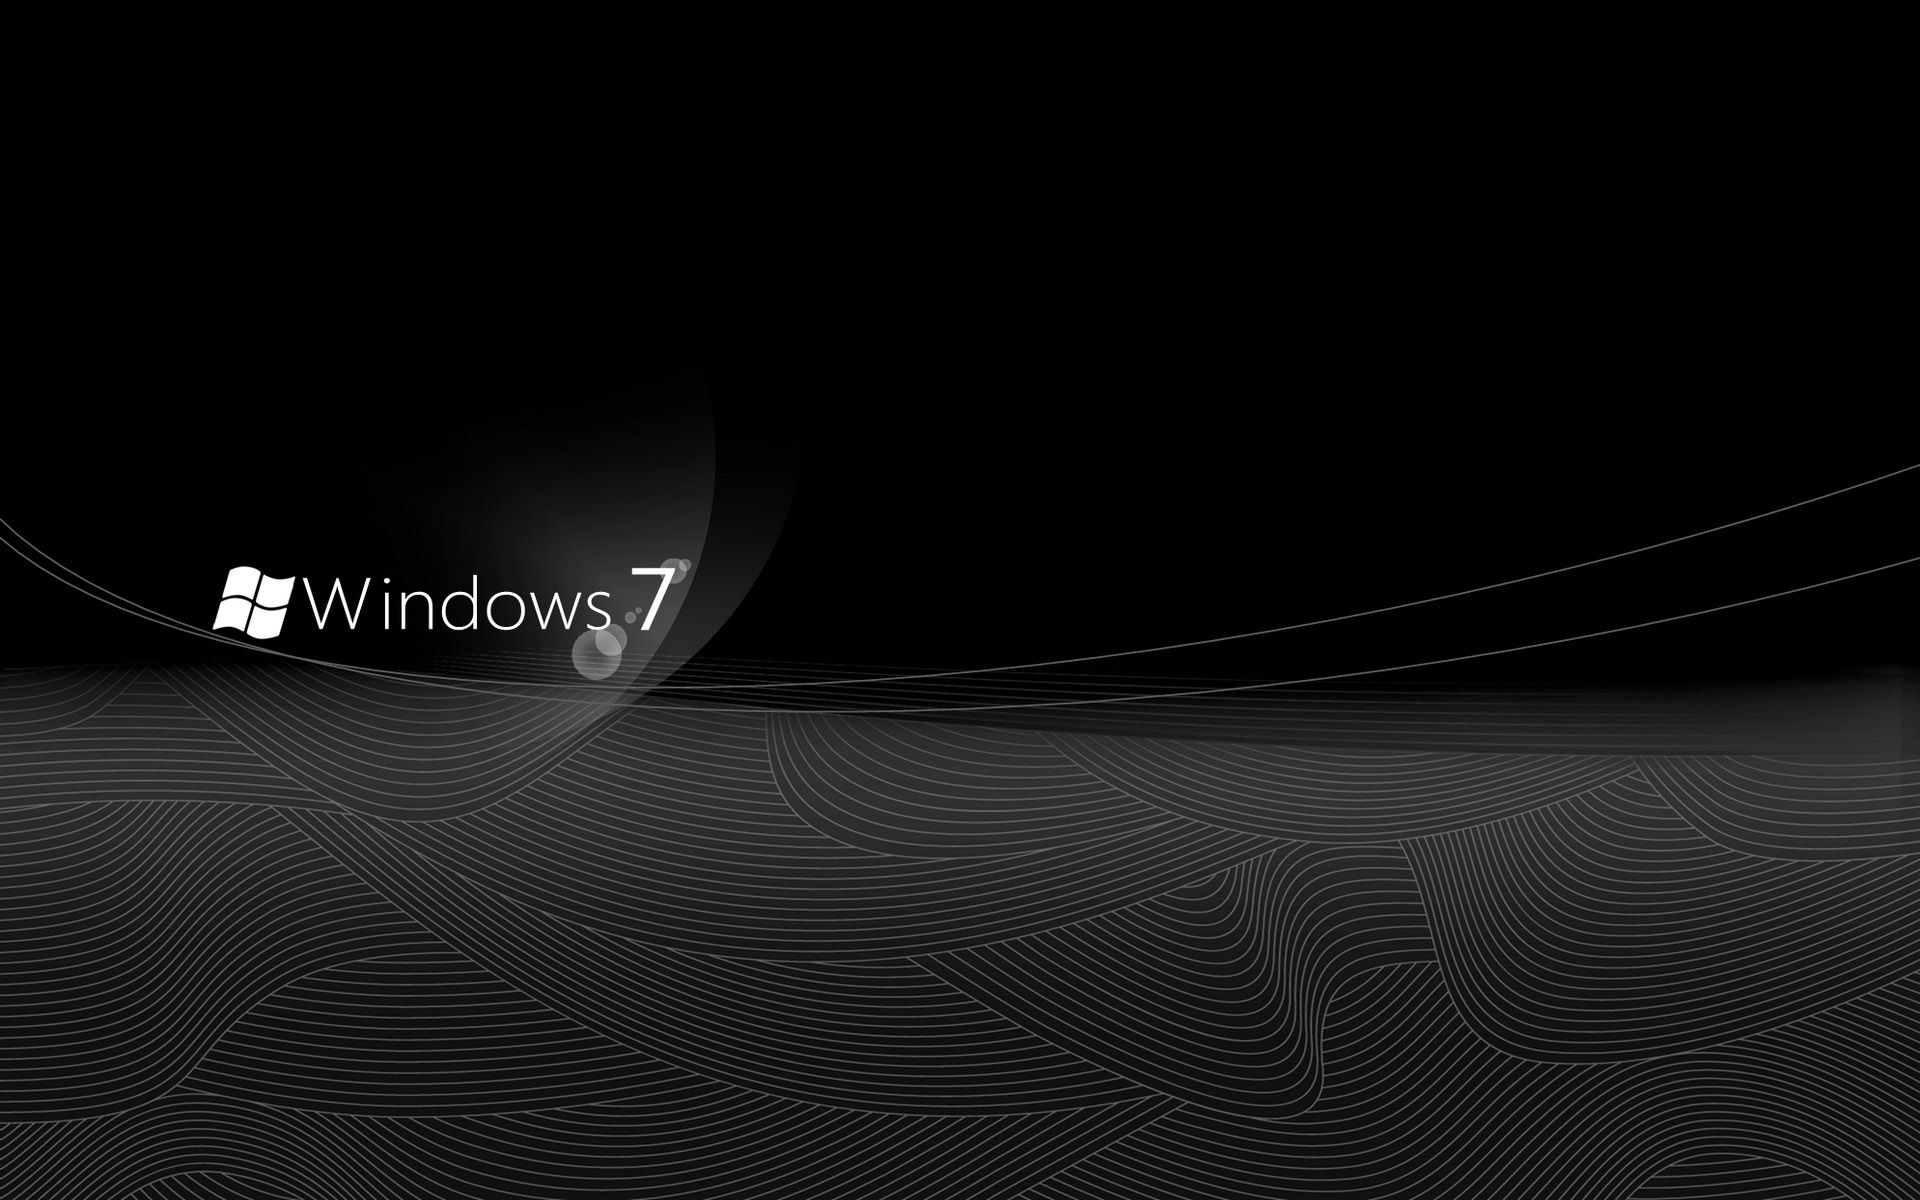 Cute Win Wallpaper Full Hd P Windows Wallpapers Hd Desktop